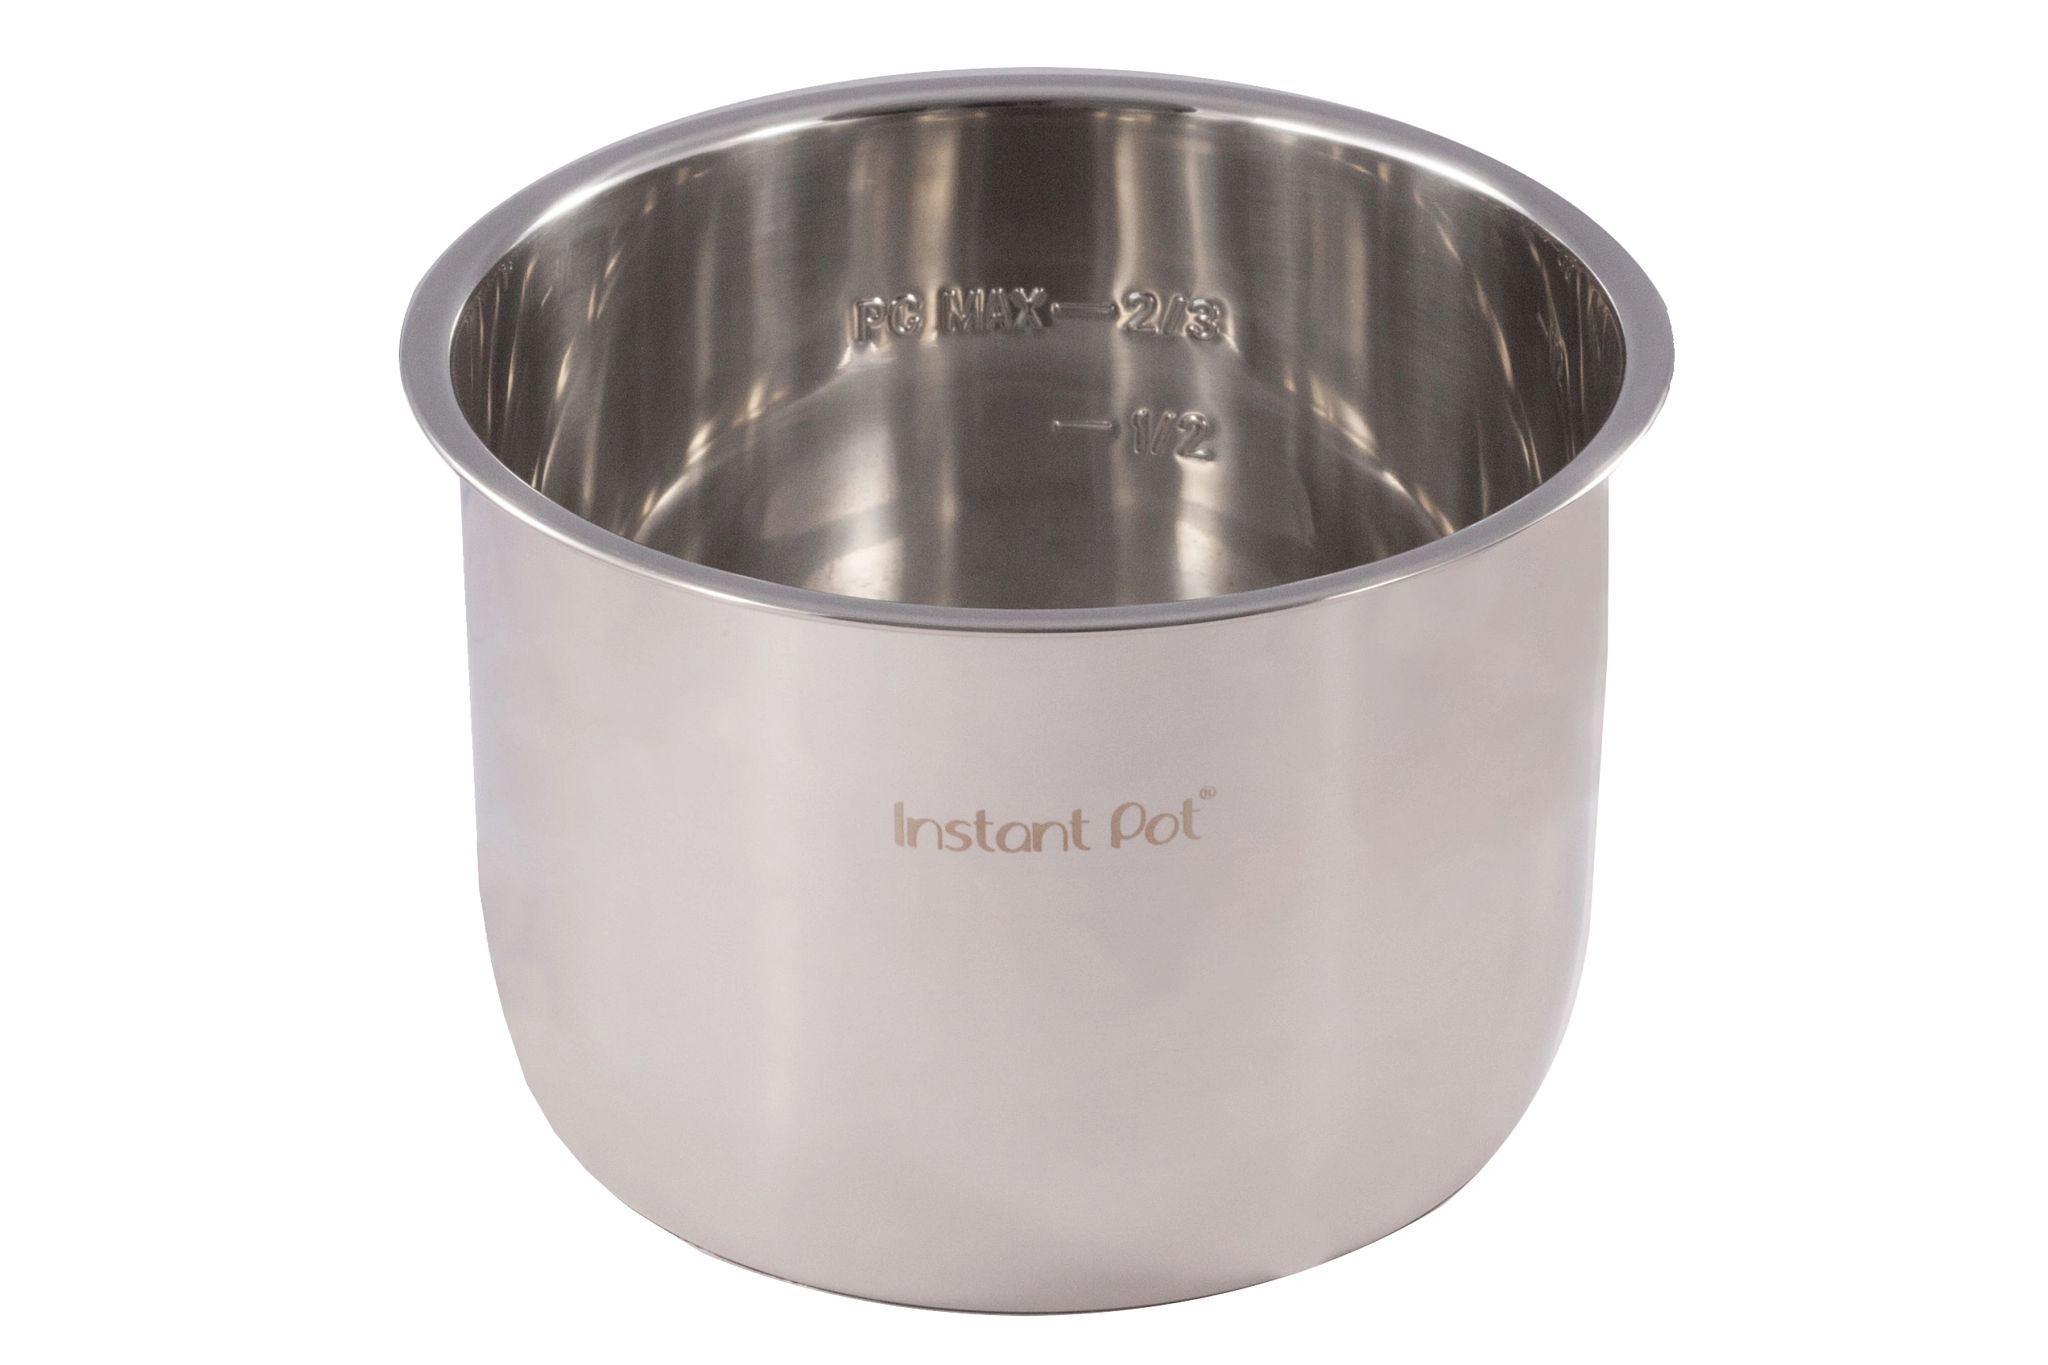 Instant Pot 8-quart Stainless Steel Inner Cooking Pot